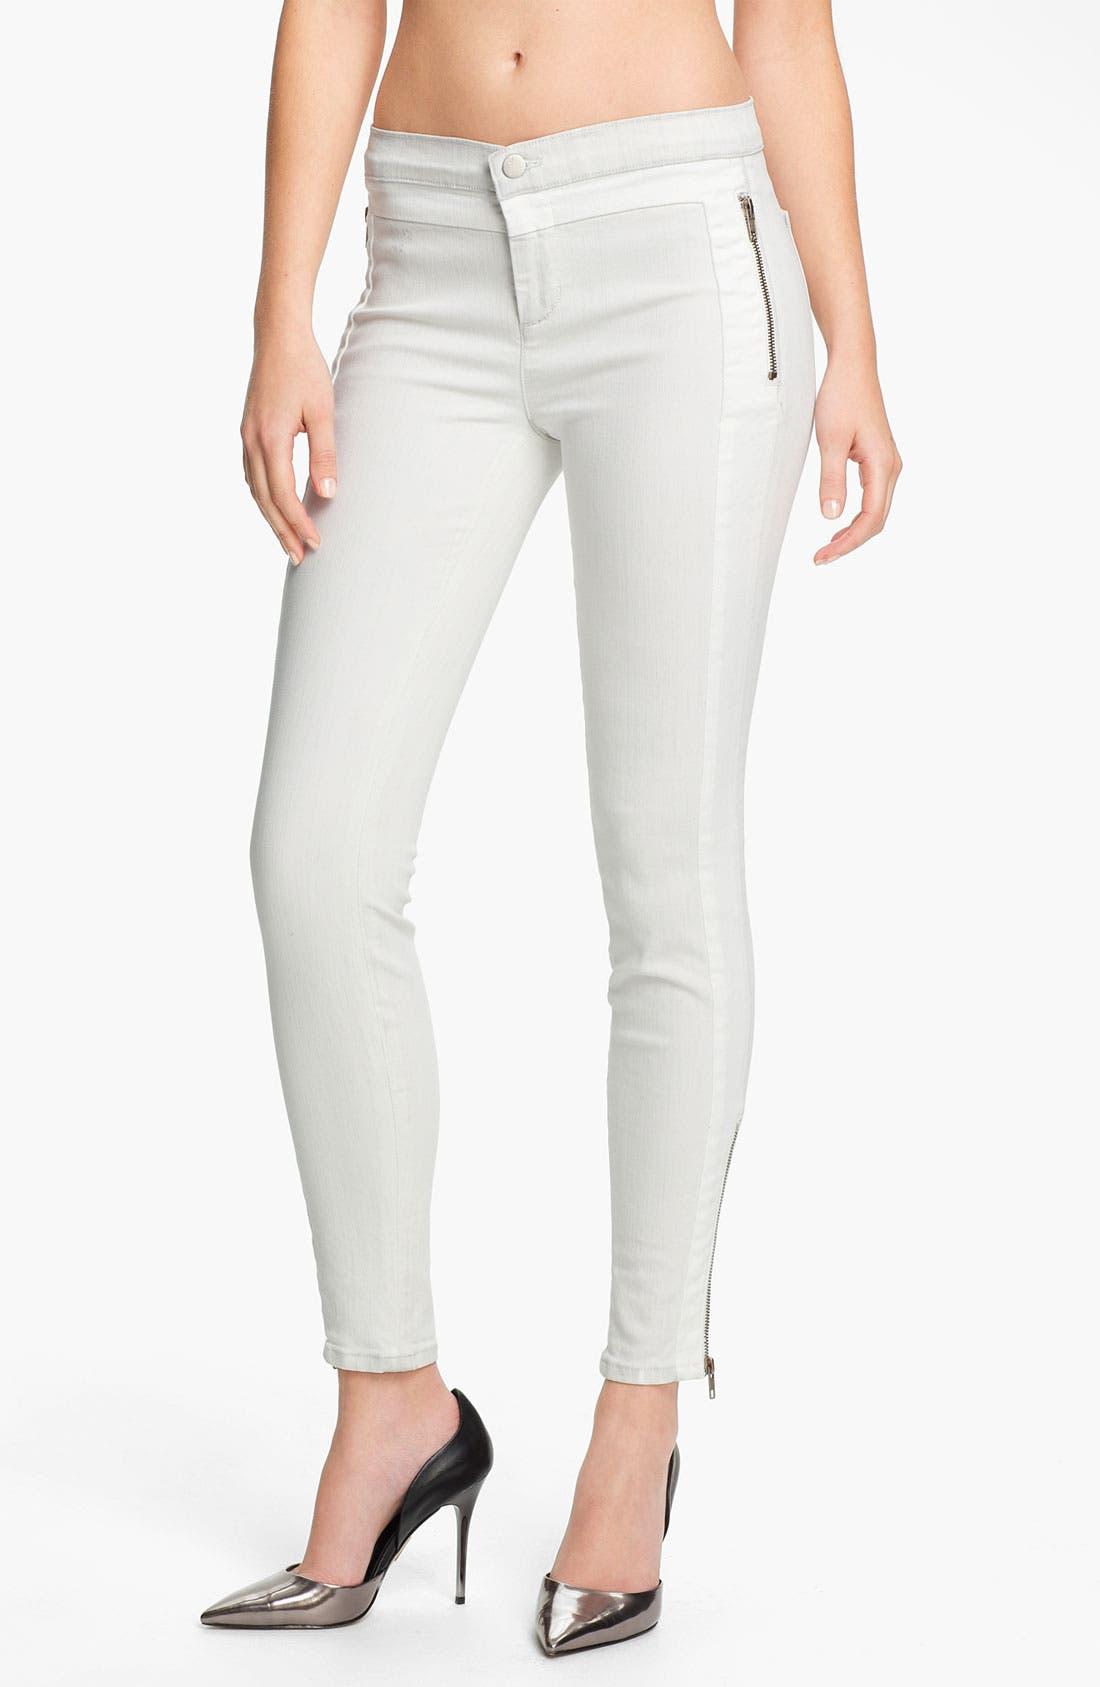 Main Image - J Brand 'Kera' Tuxedo Stripe Skinny Jeans (Iceberg)